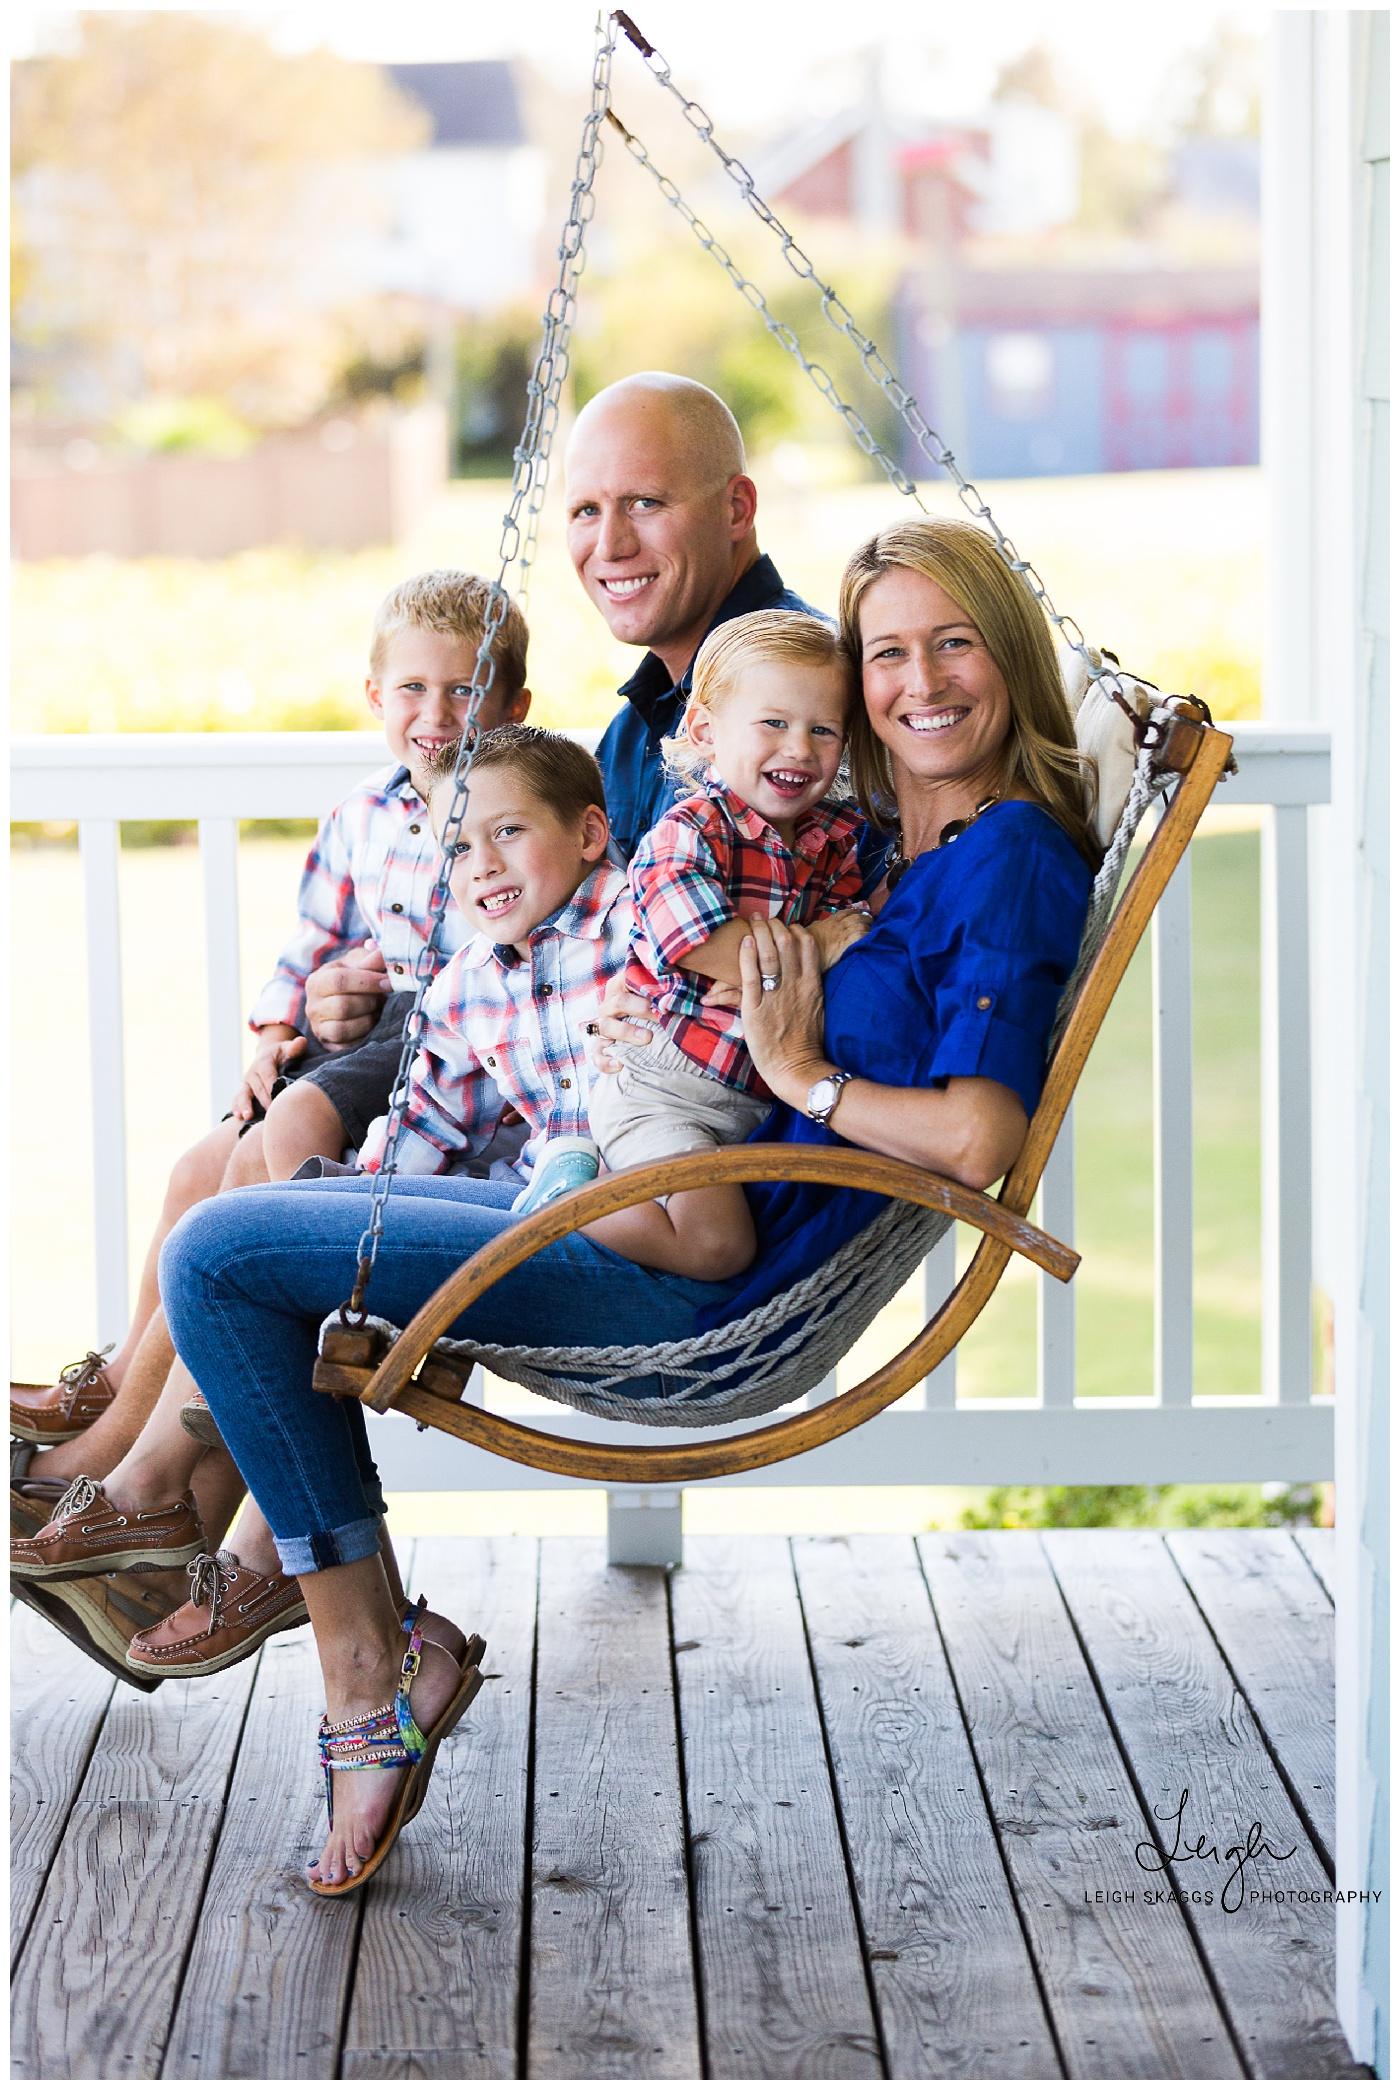 The Davis Family | FUN Family Portrait session